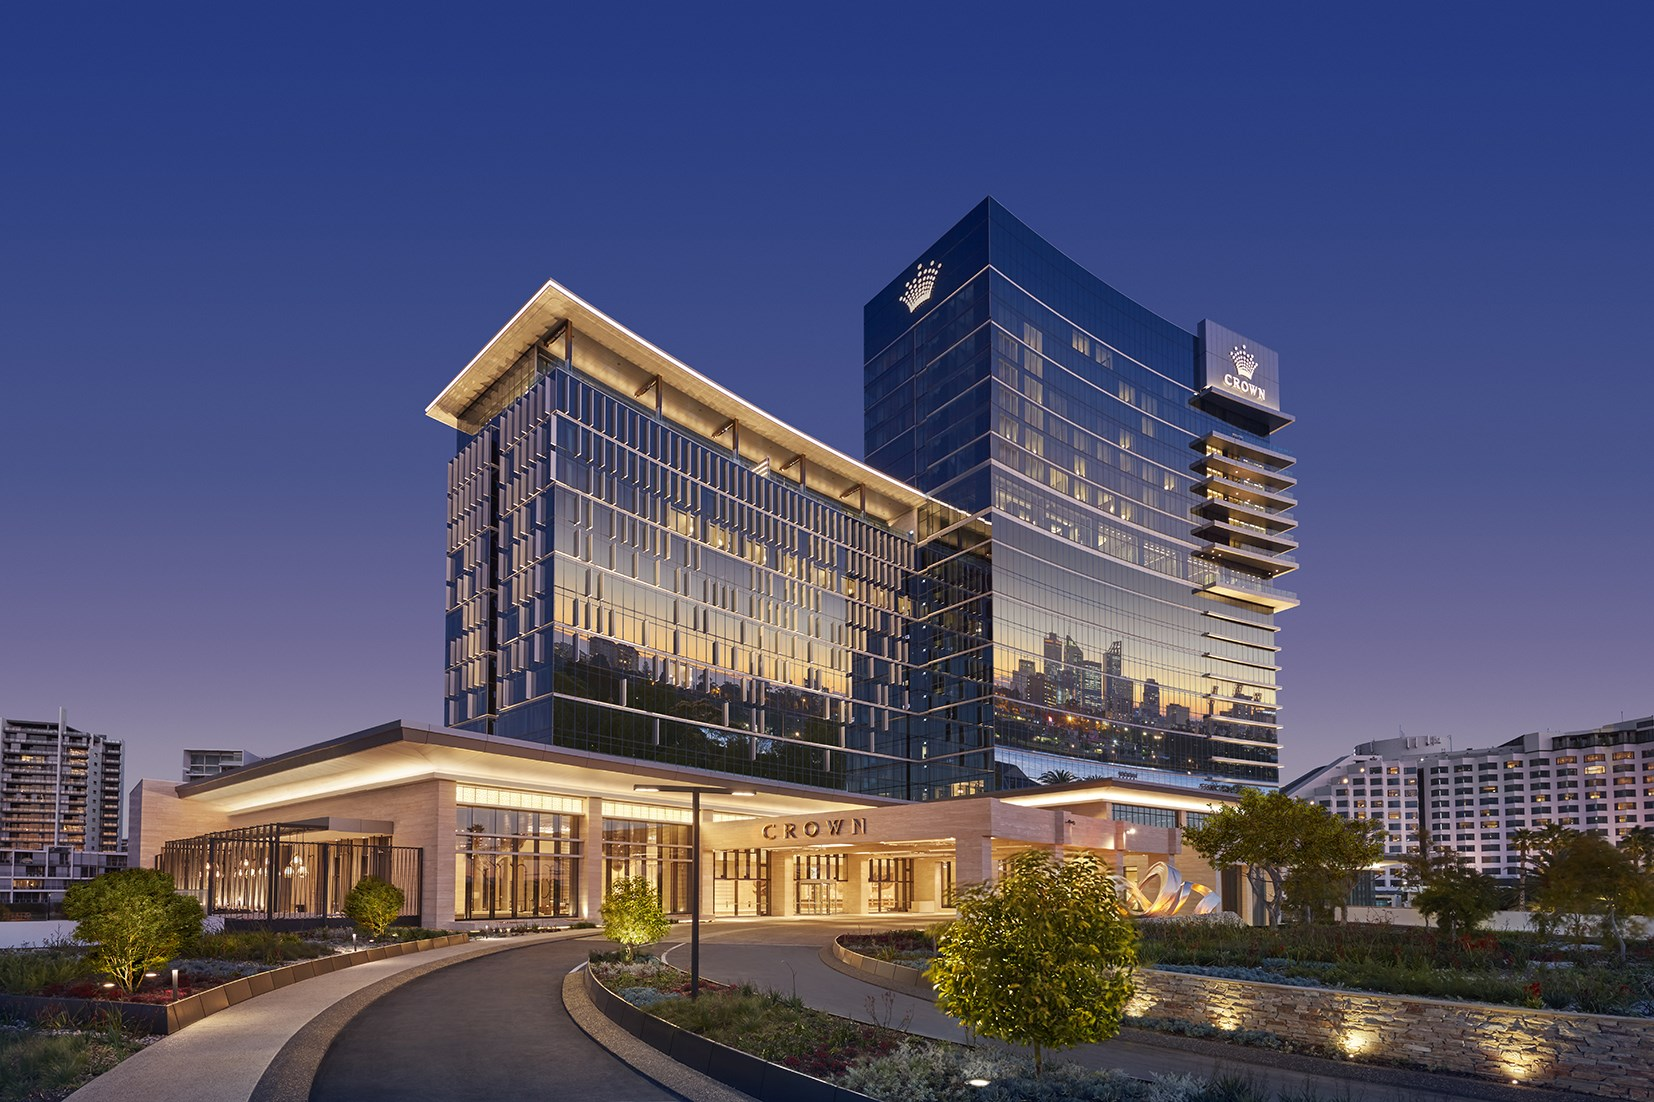 Job at crown casino perth largest native american casino